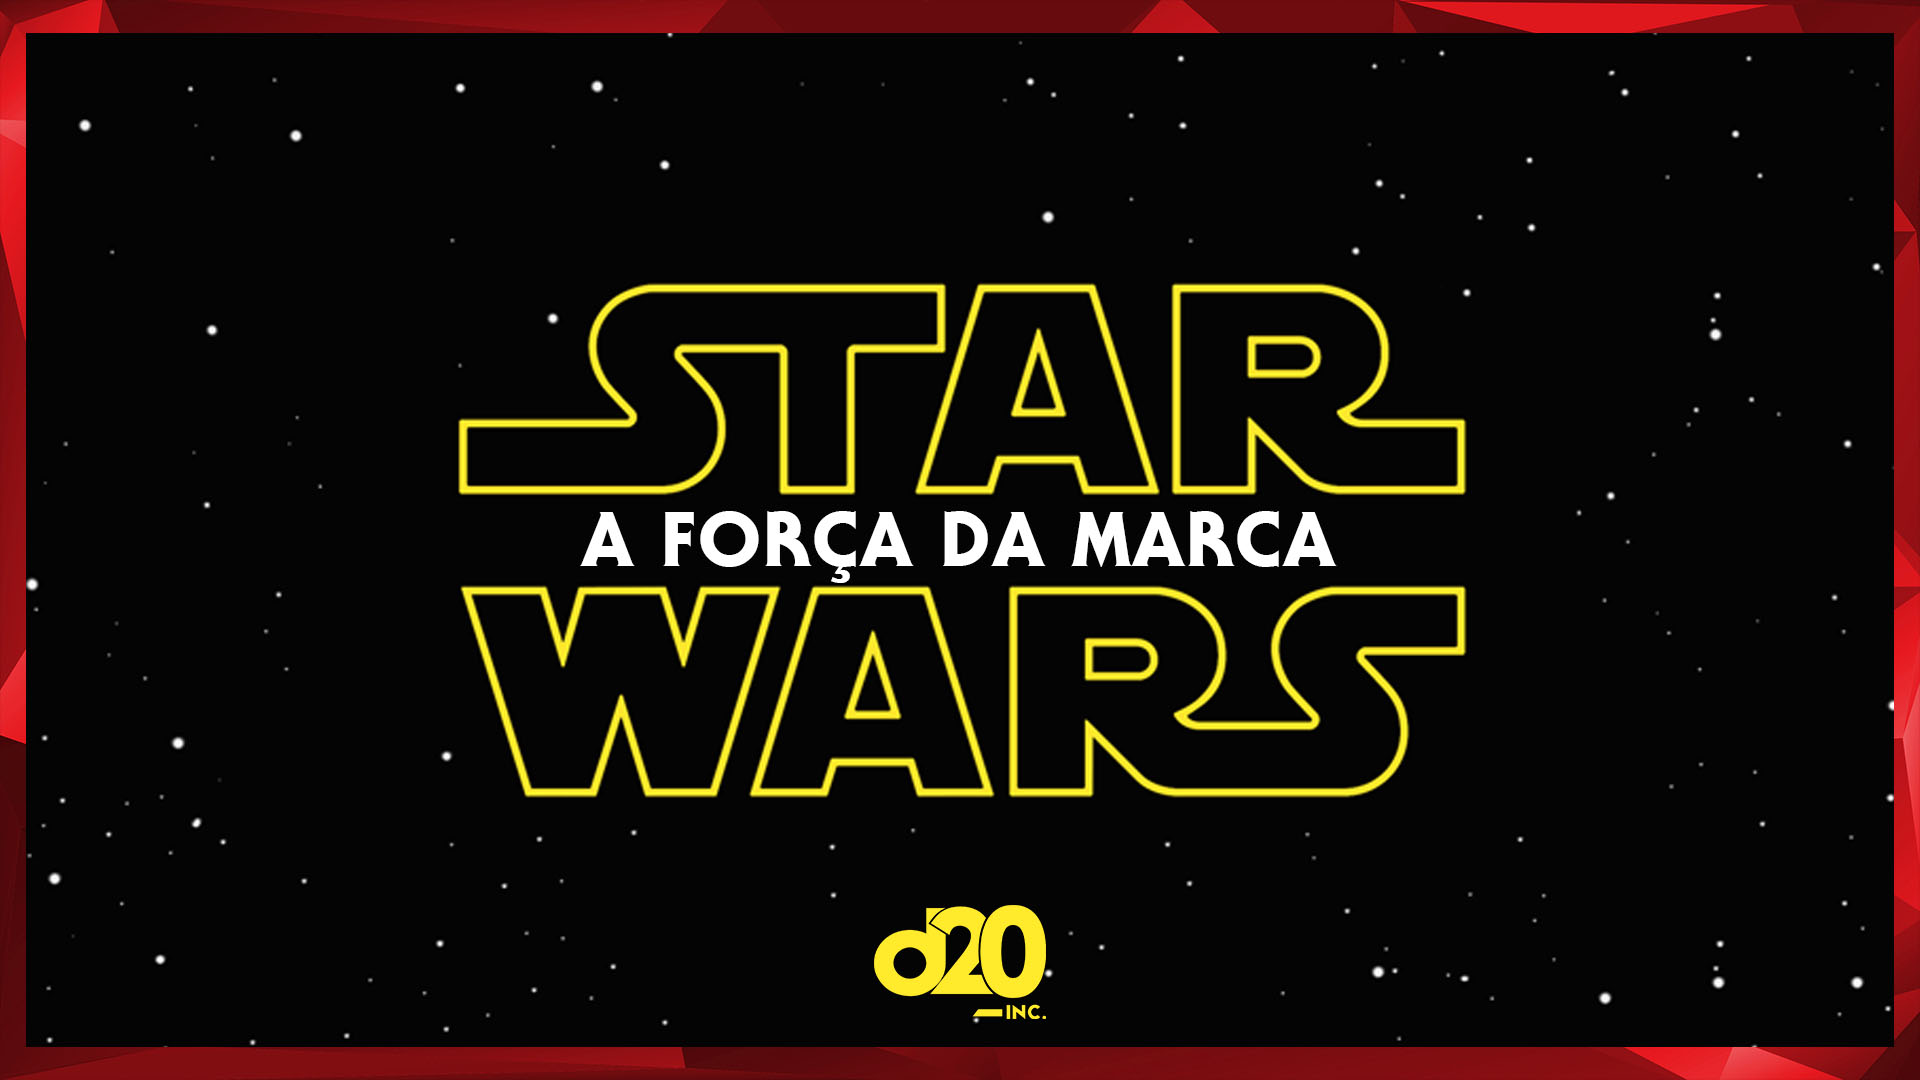 O Fenômeno Star Wars | D20 Lab 29